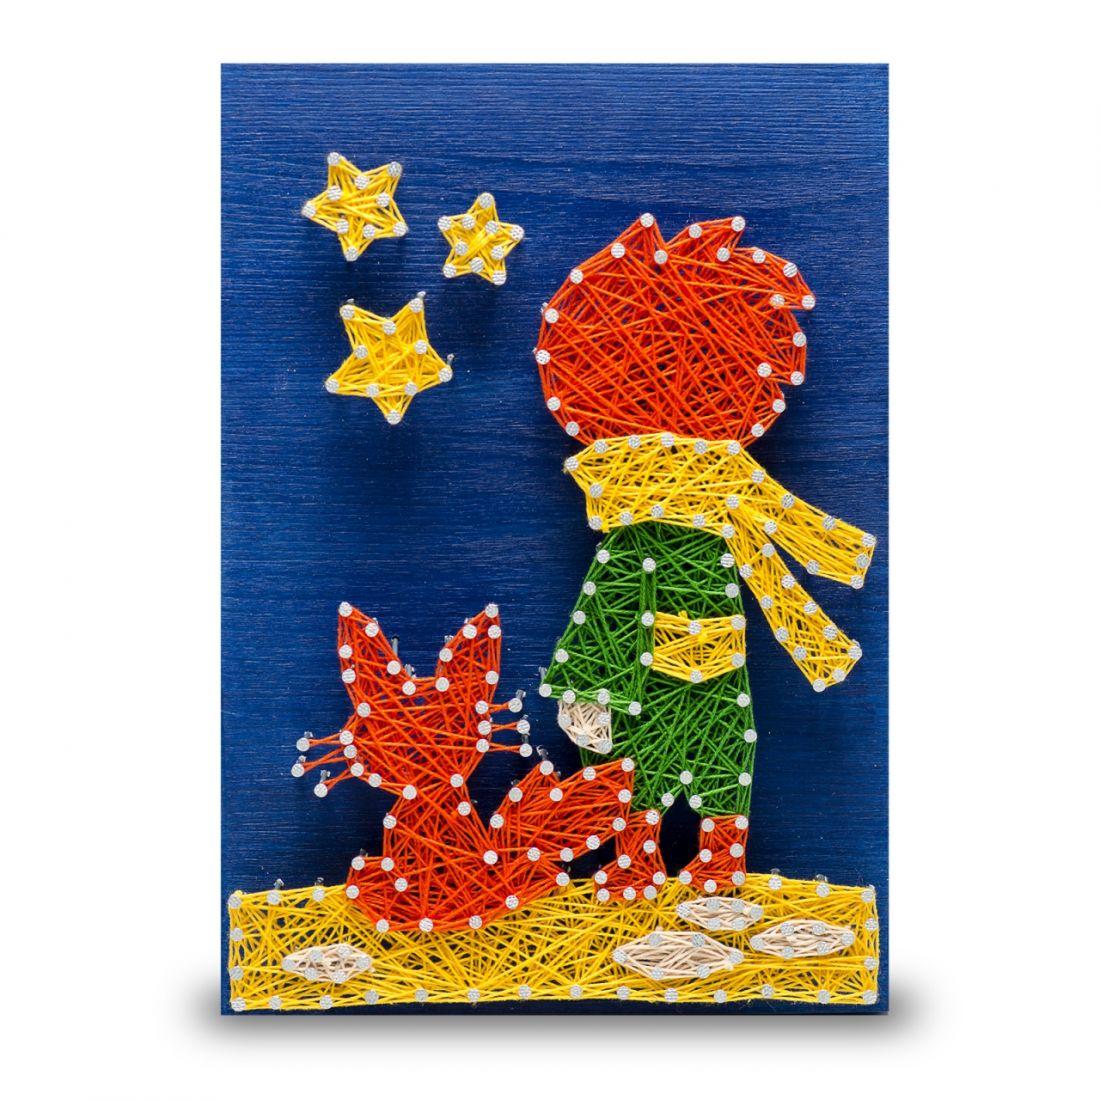 Стринг арт STRING ART LAB A4015 Маленький Принц